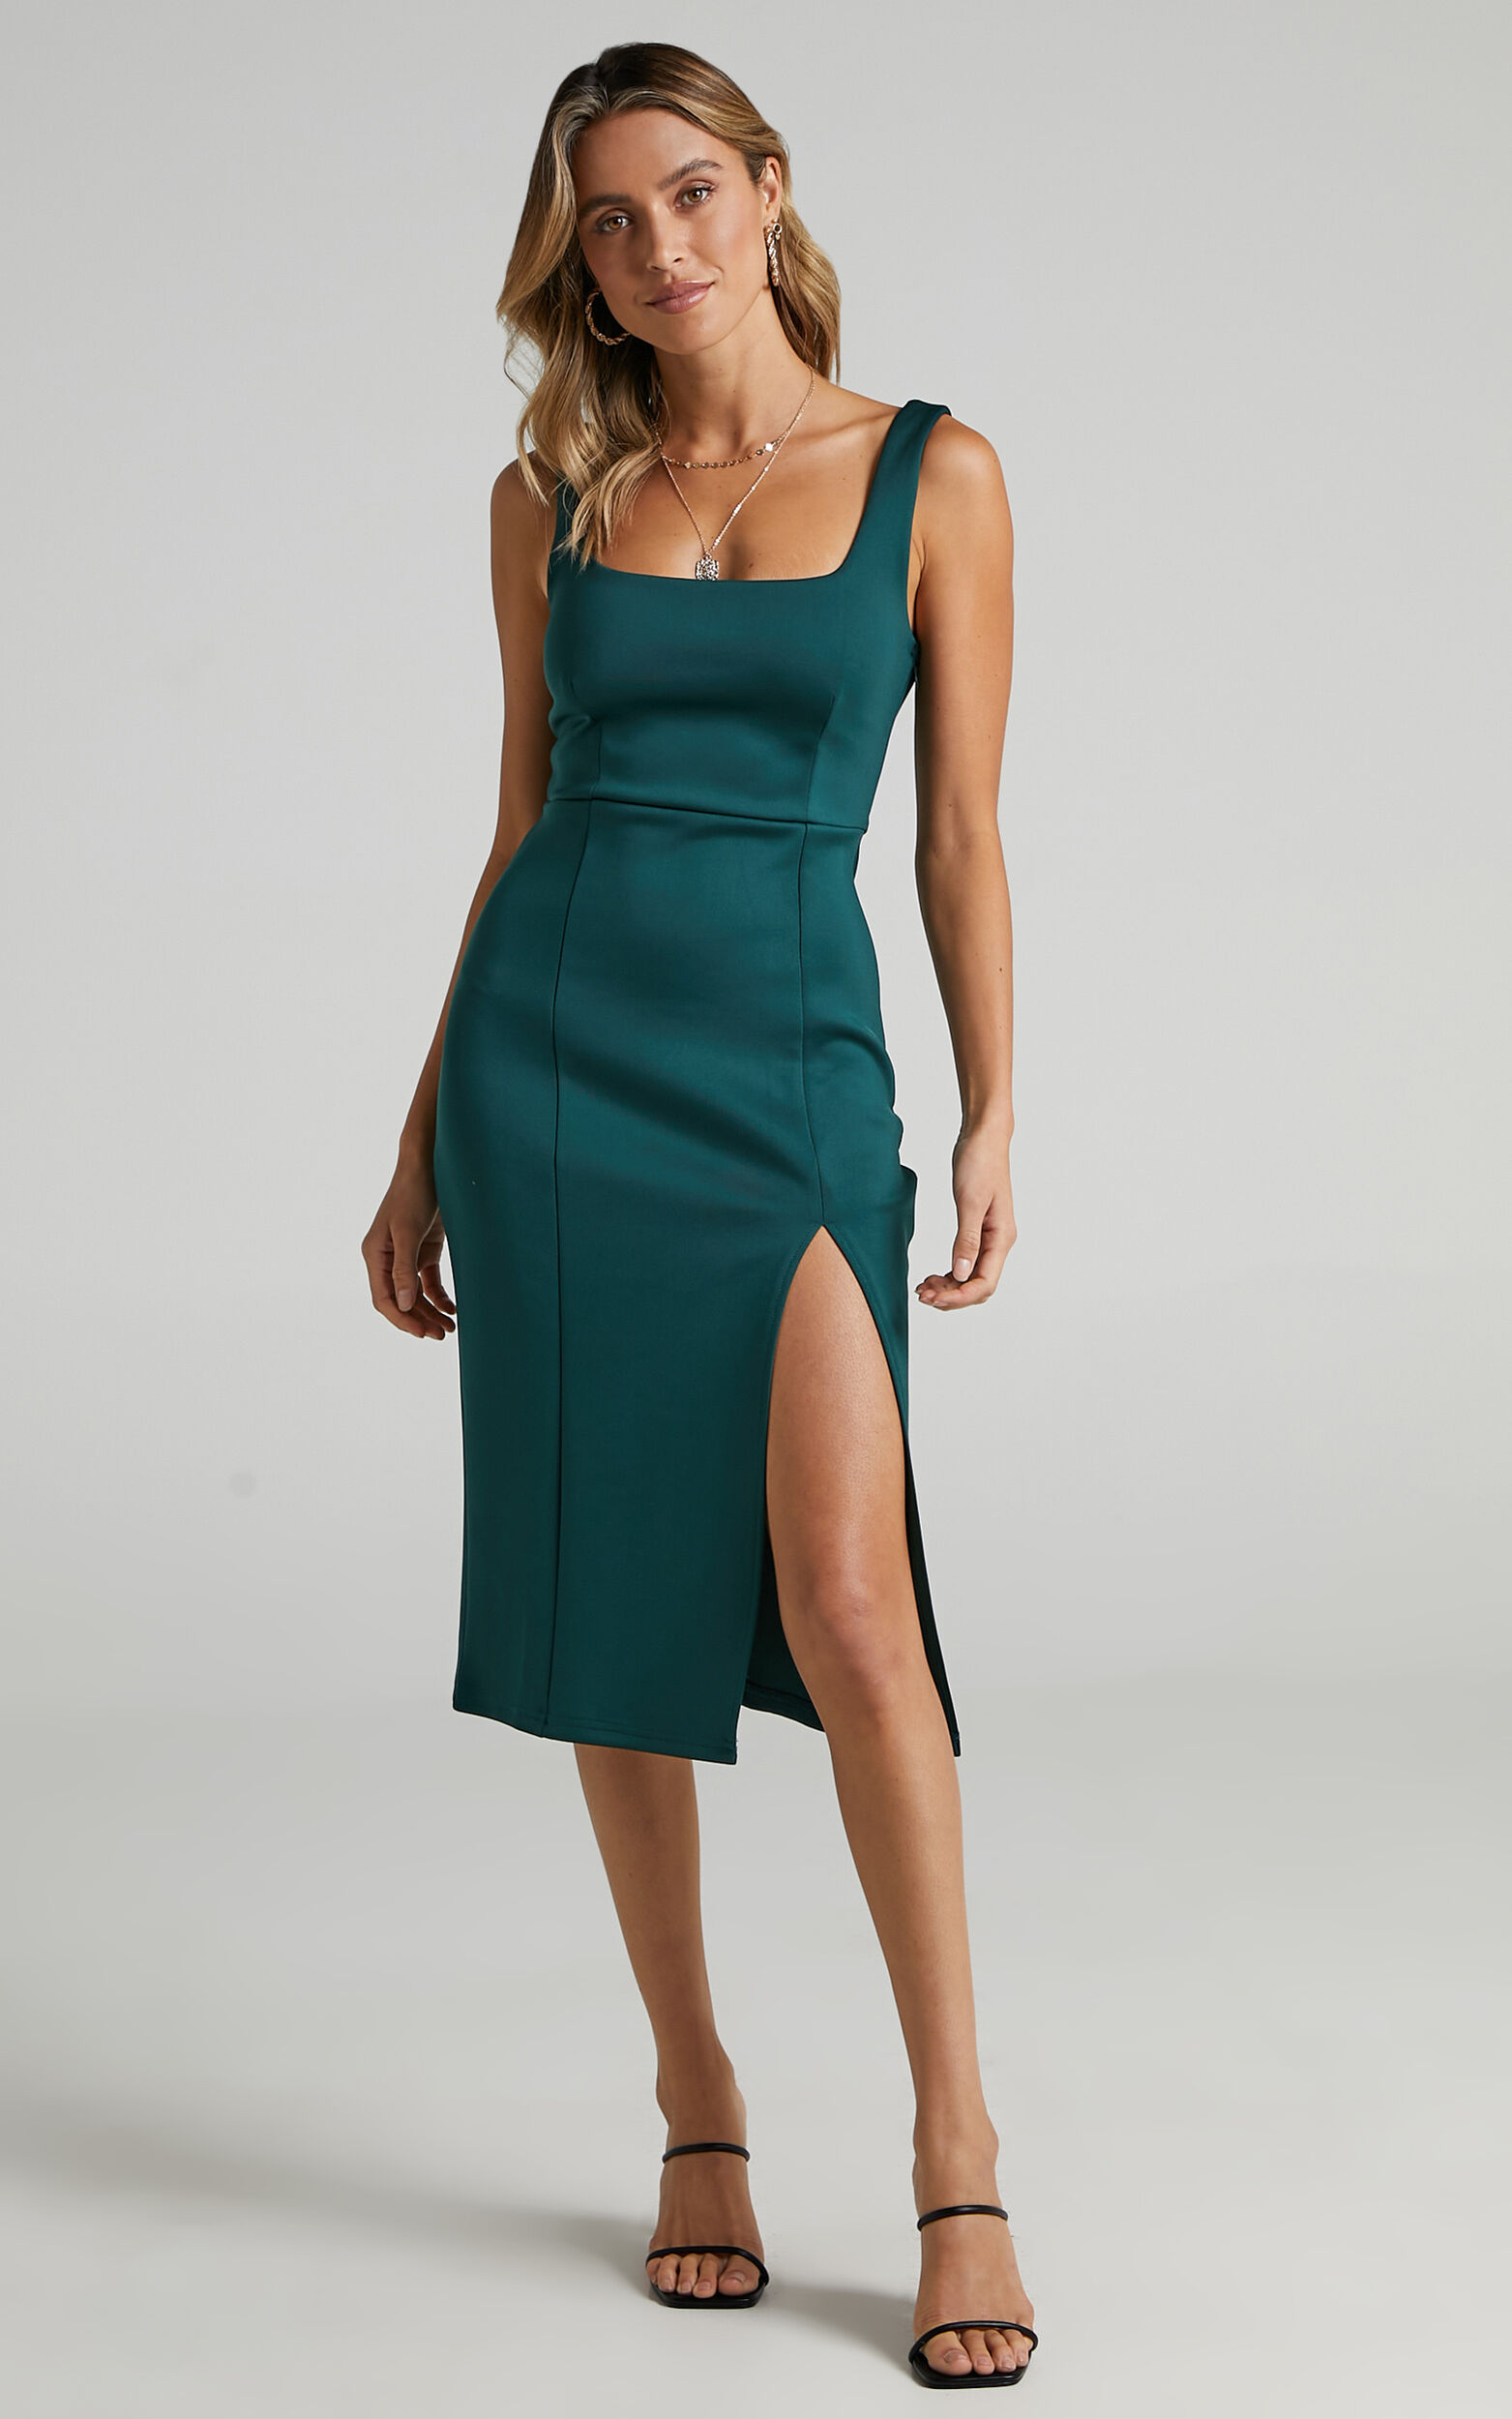 Mini Love Square Neck Split Midi Dress in Emerald - 04, GRN5, super-hi-res image number null